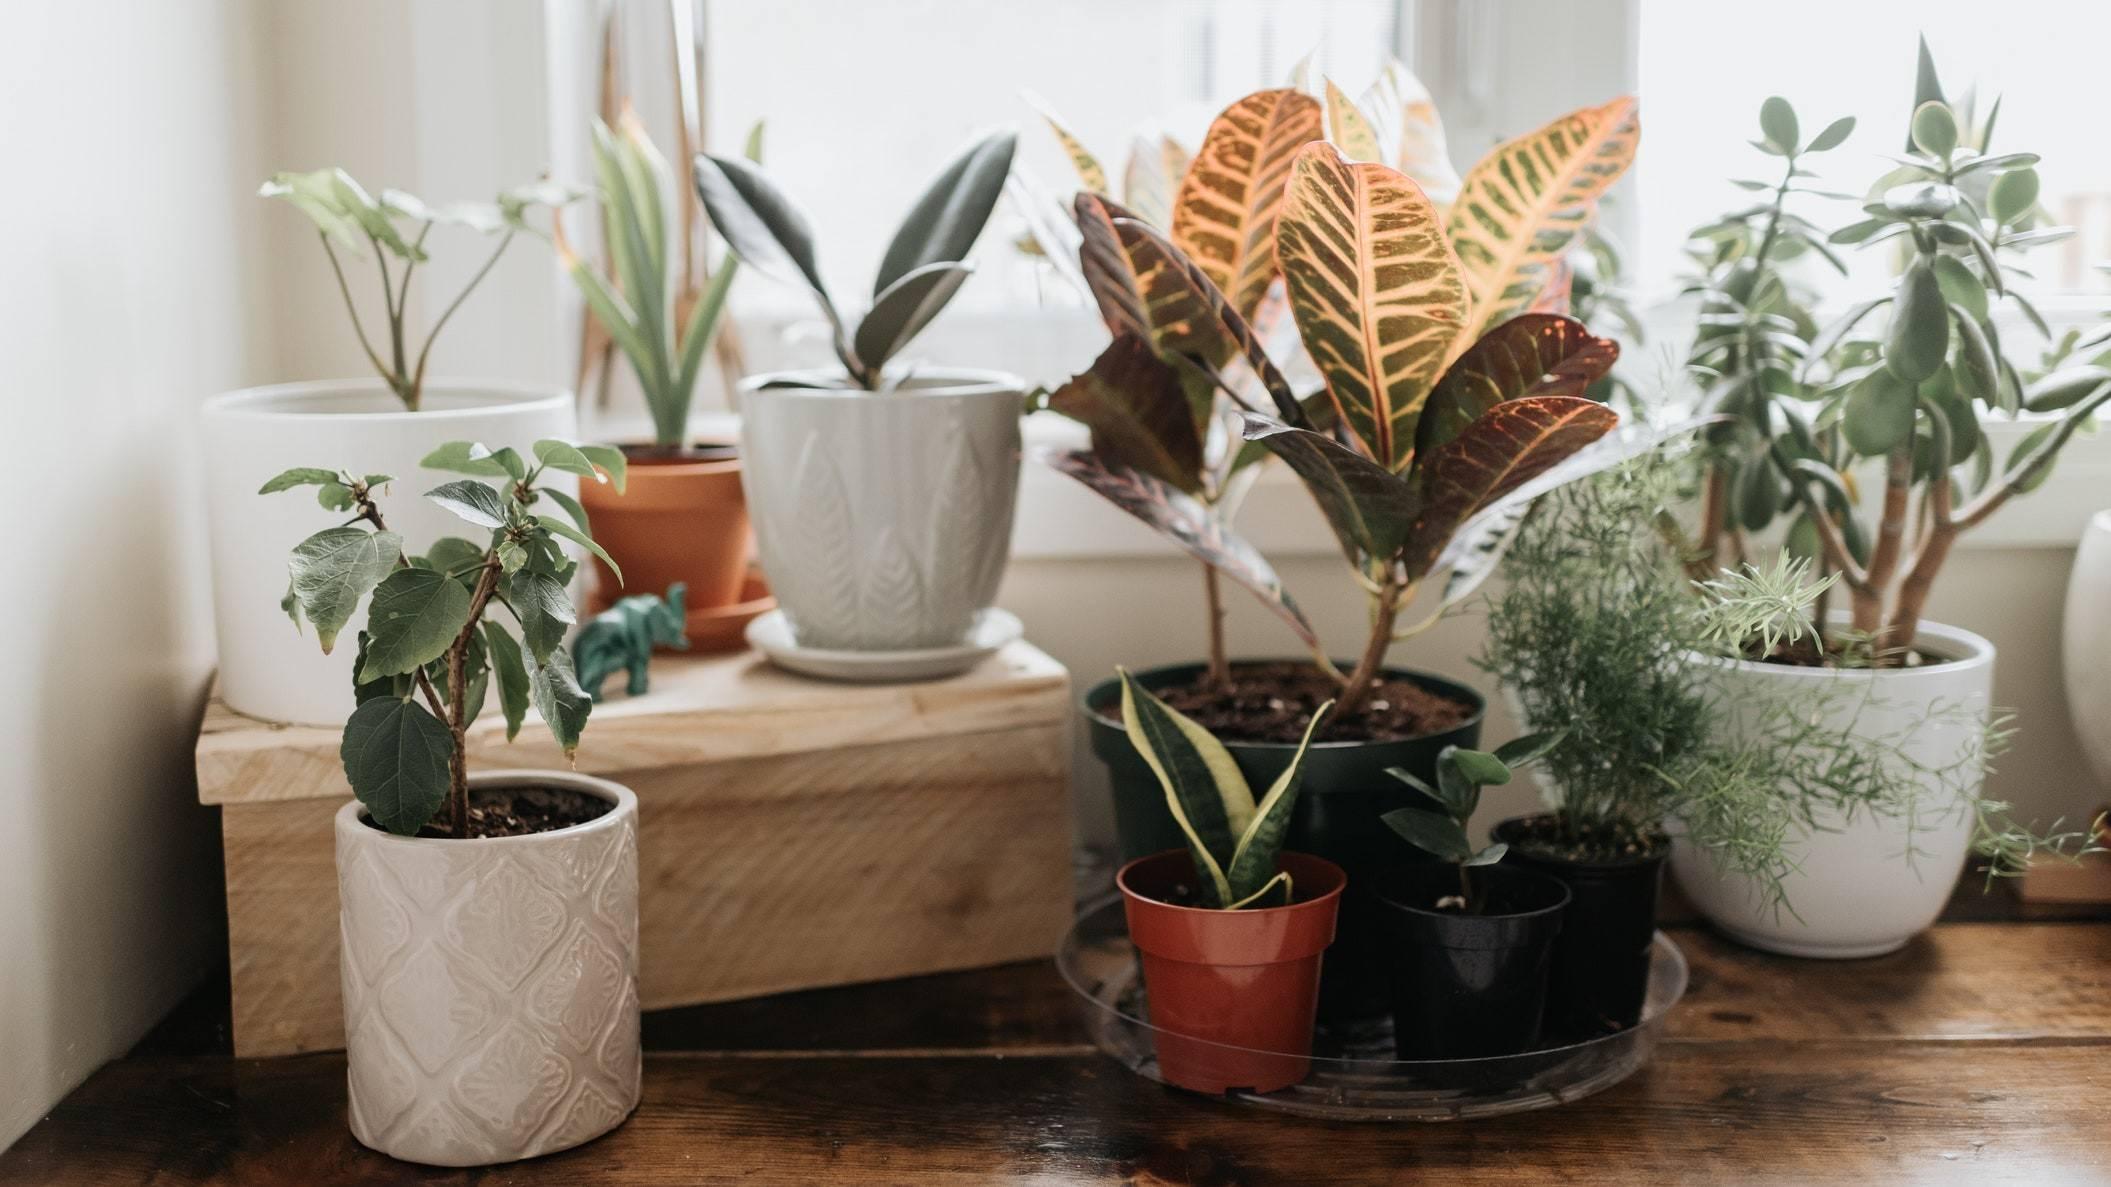 multiple plants in various pots sitting along window